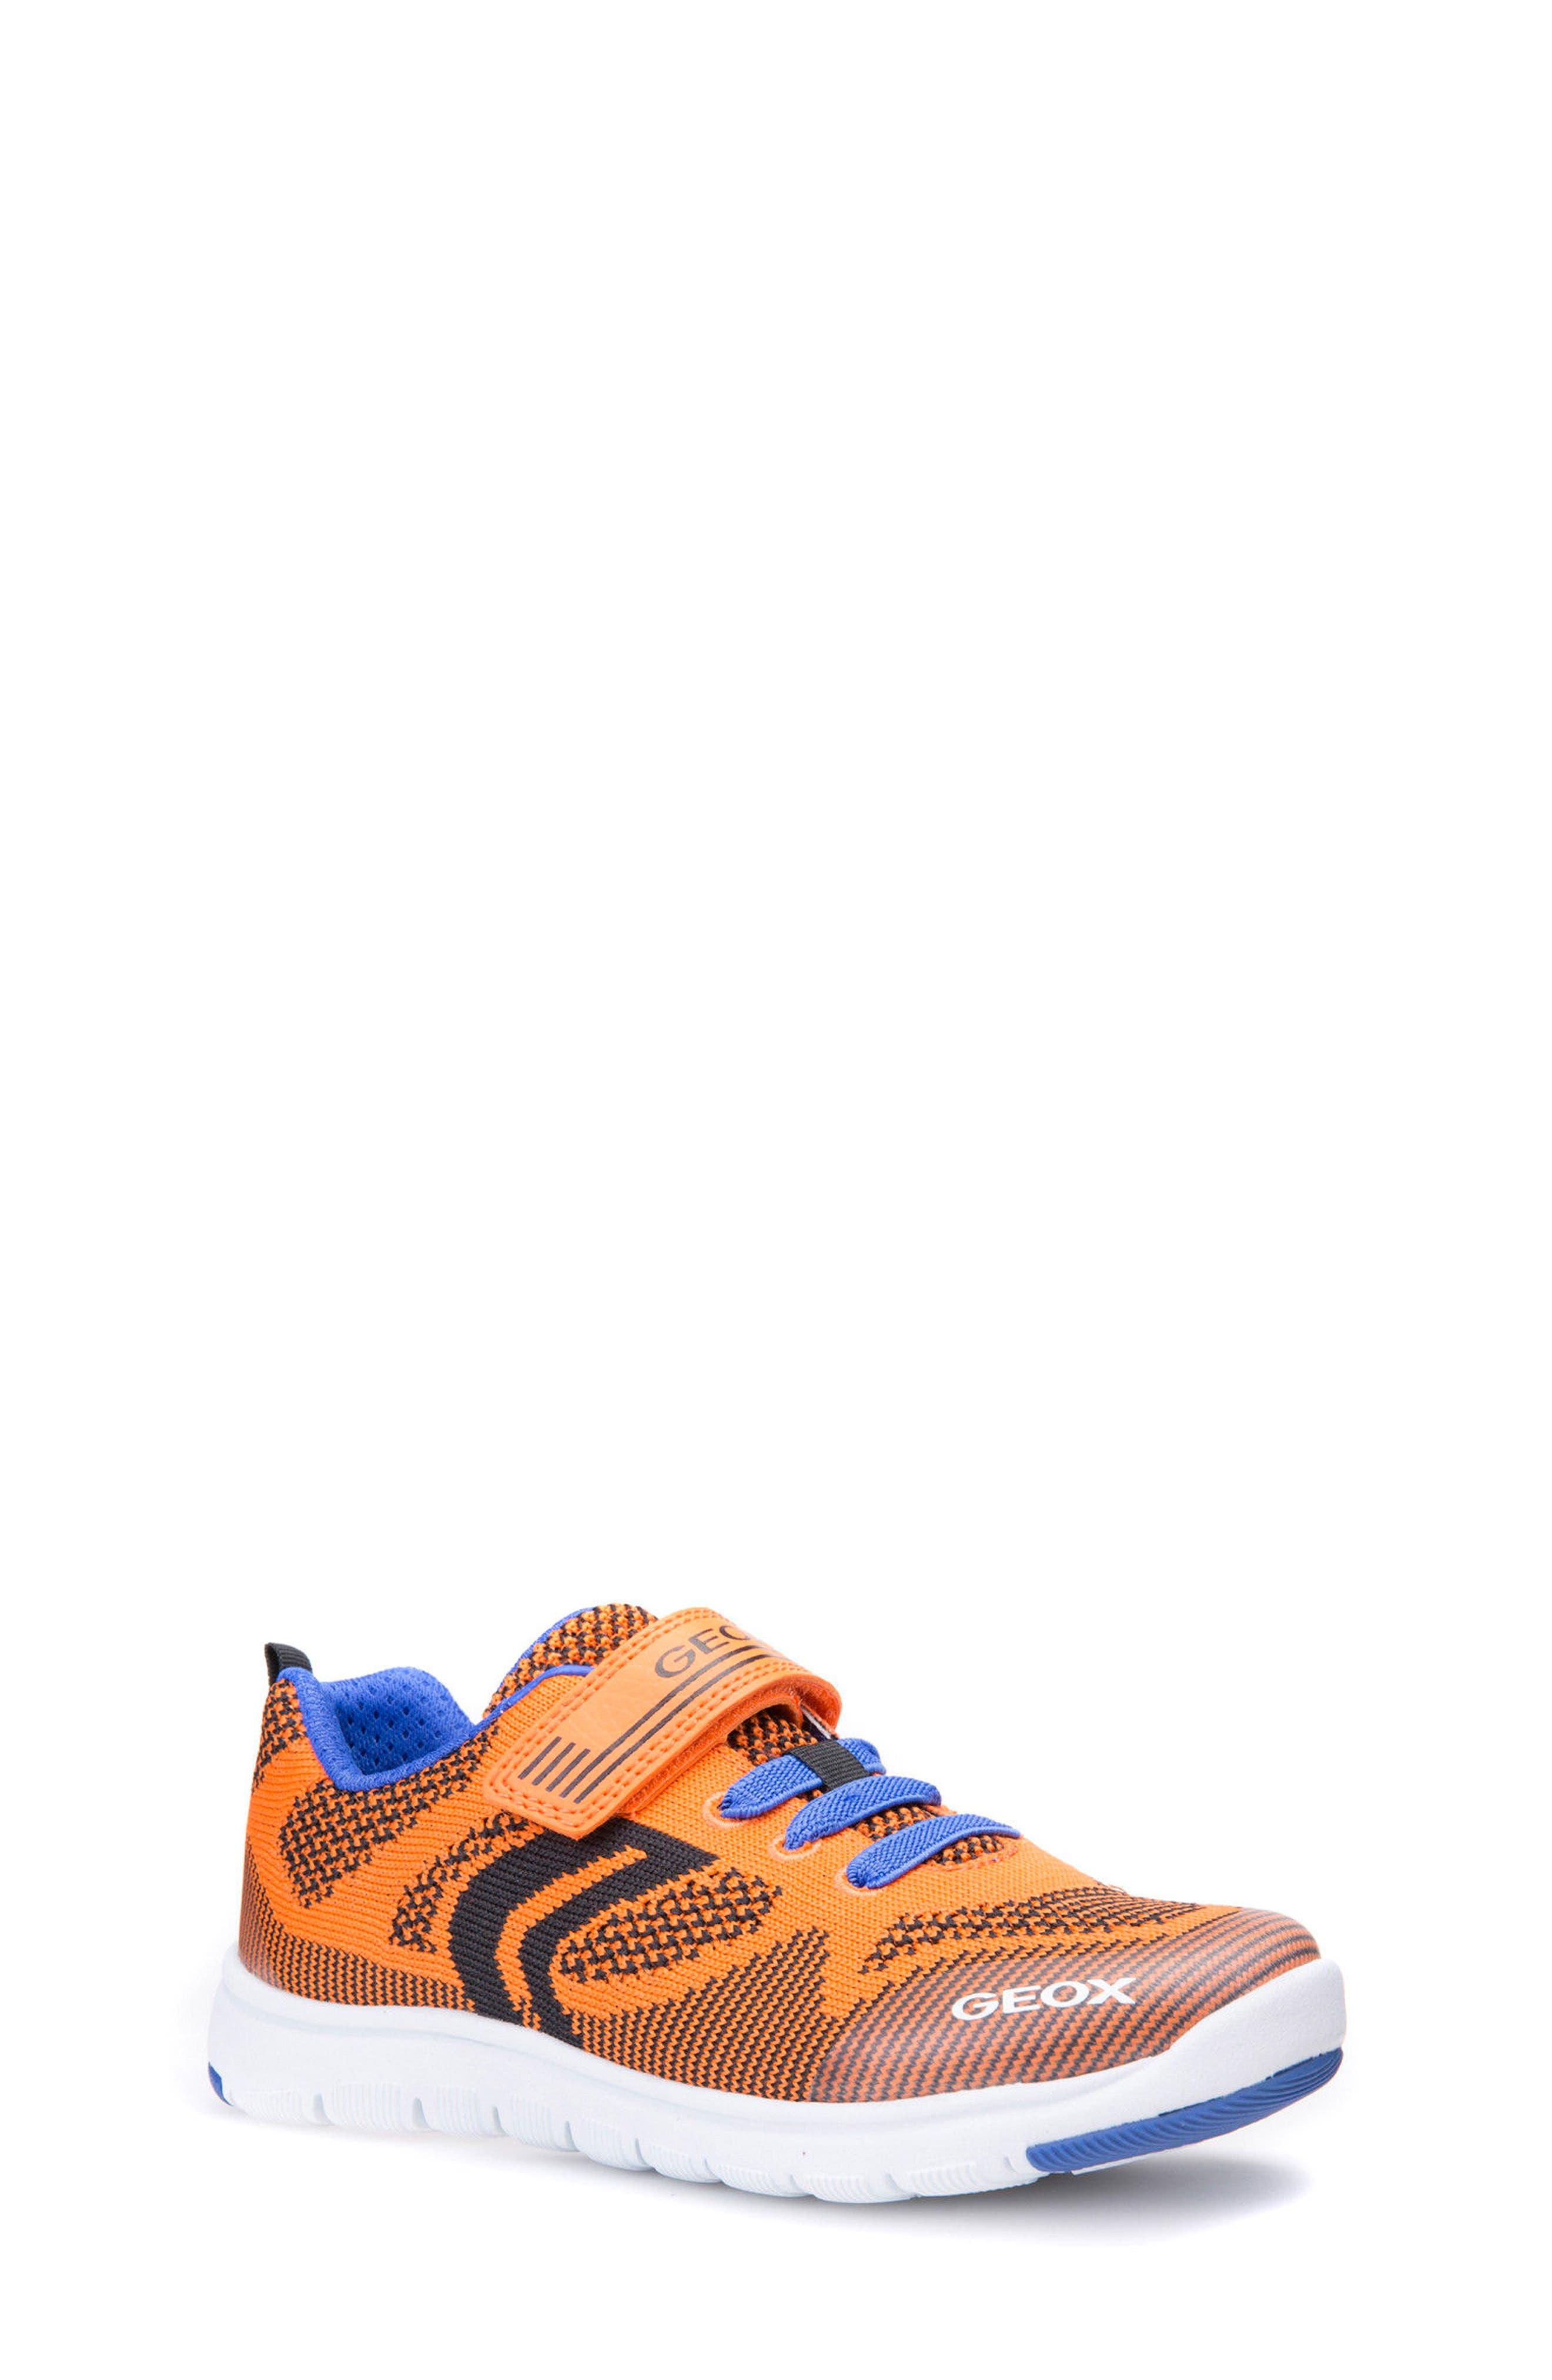 Xunday Low Top Woven Sneaker,                         Main,                         color, Orange/ Royal